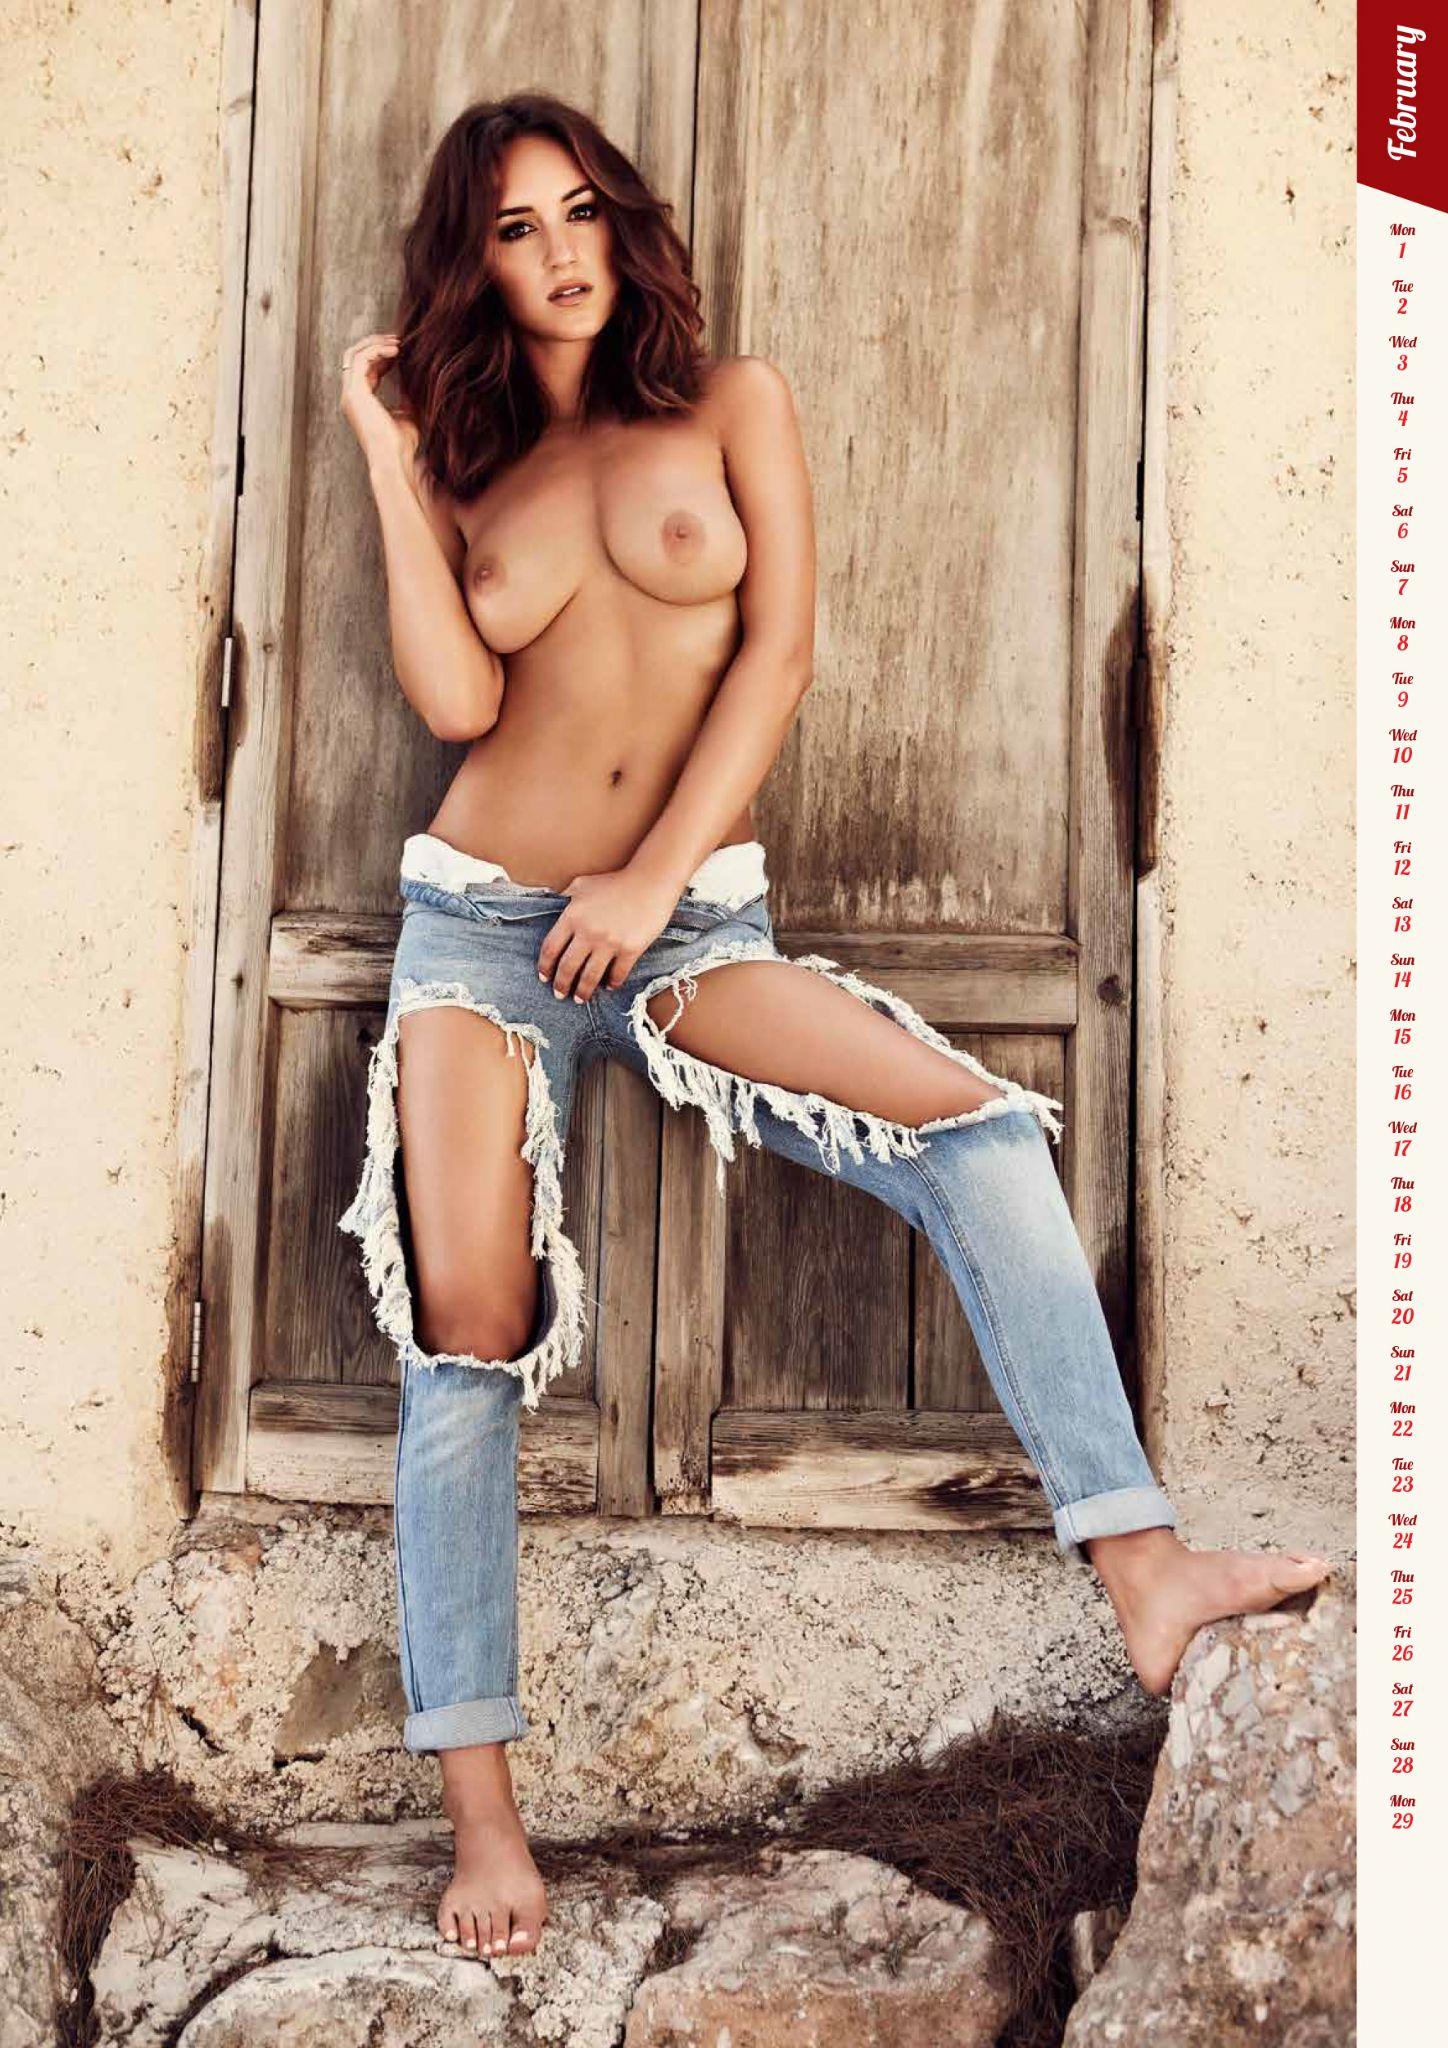 Nudist Calendar - Rosie Jones Nude Photos and Videos   #TheFappening